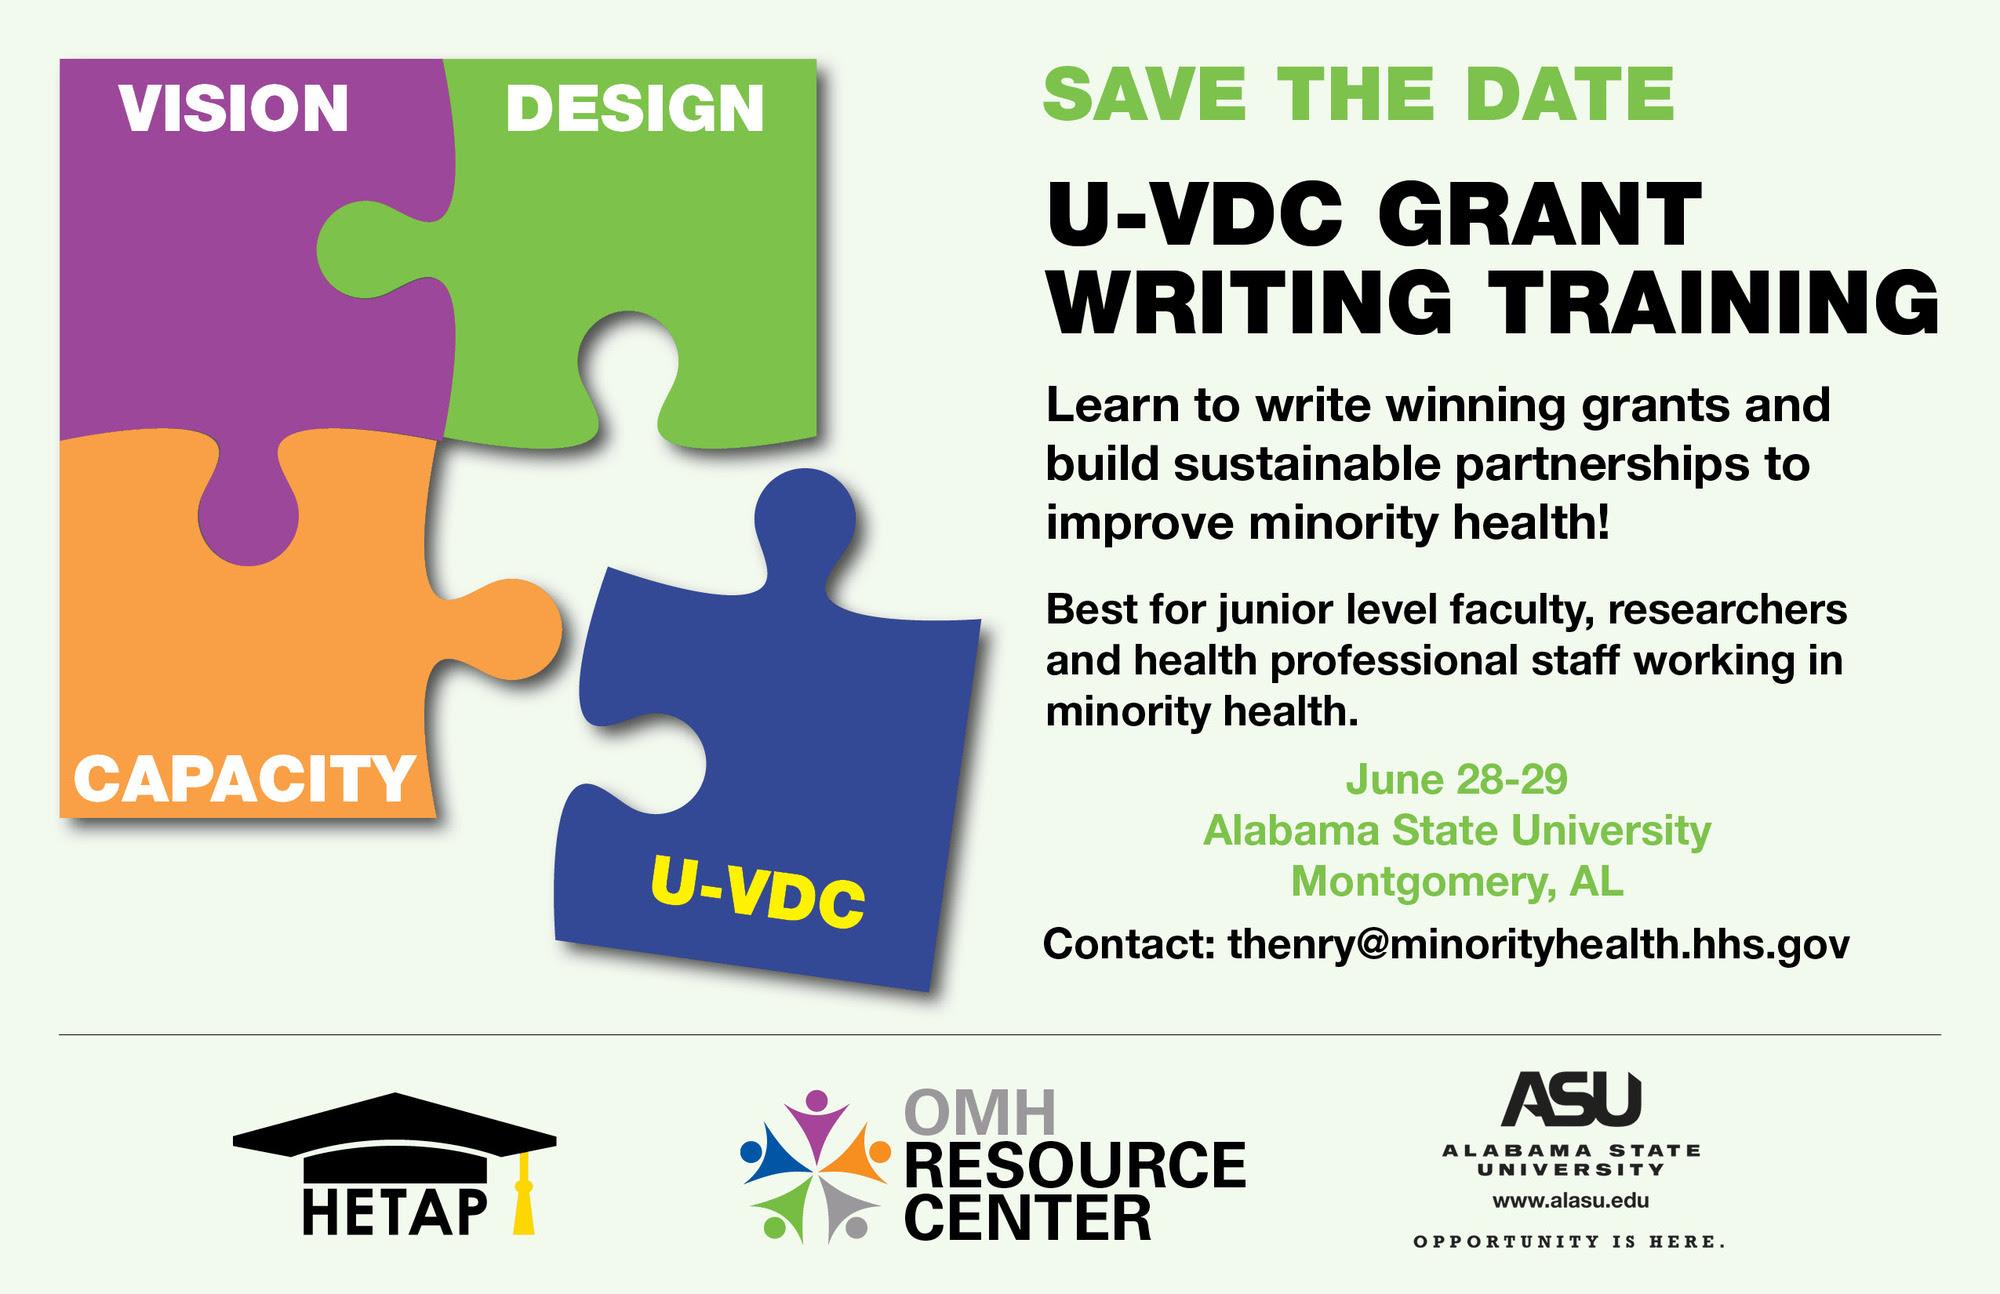 U-VDC Grant Writing Training June 28-29